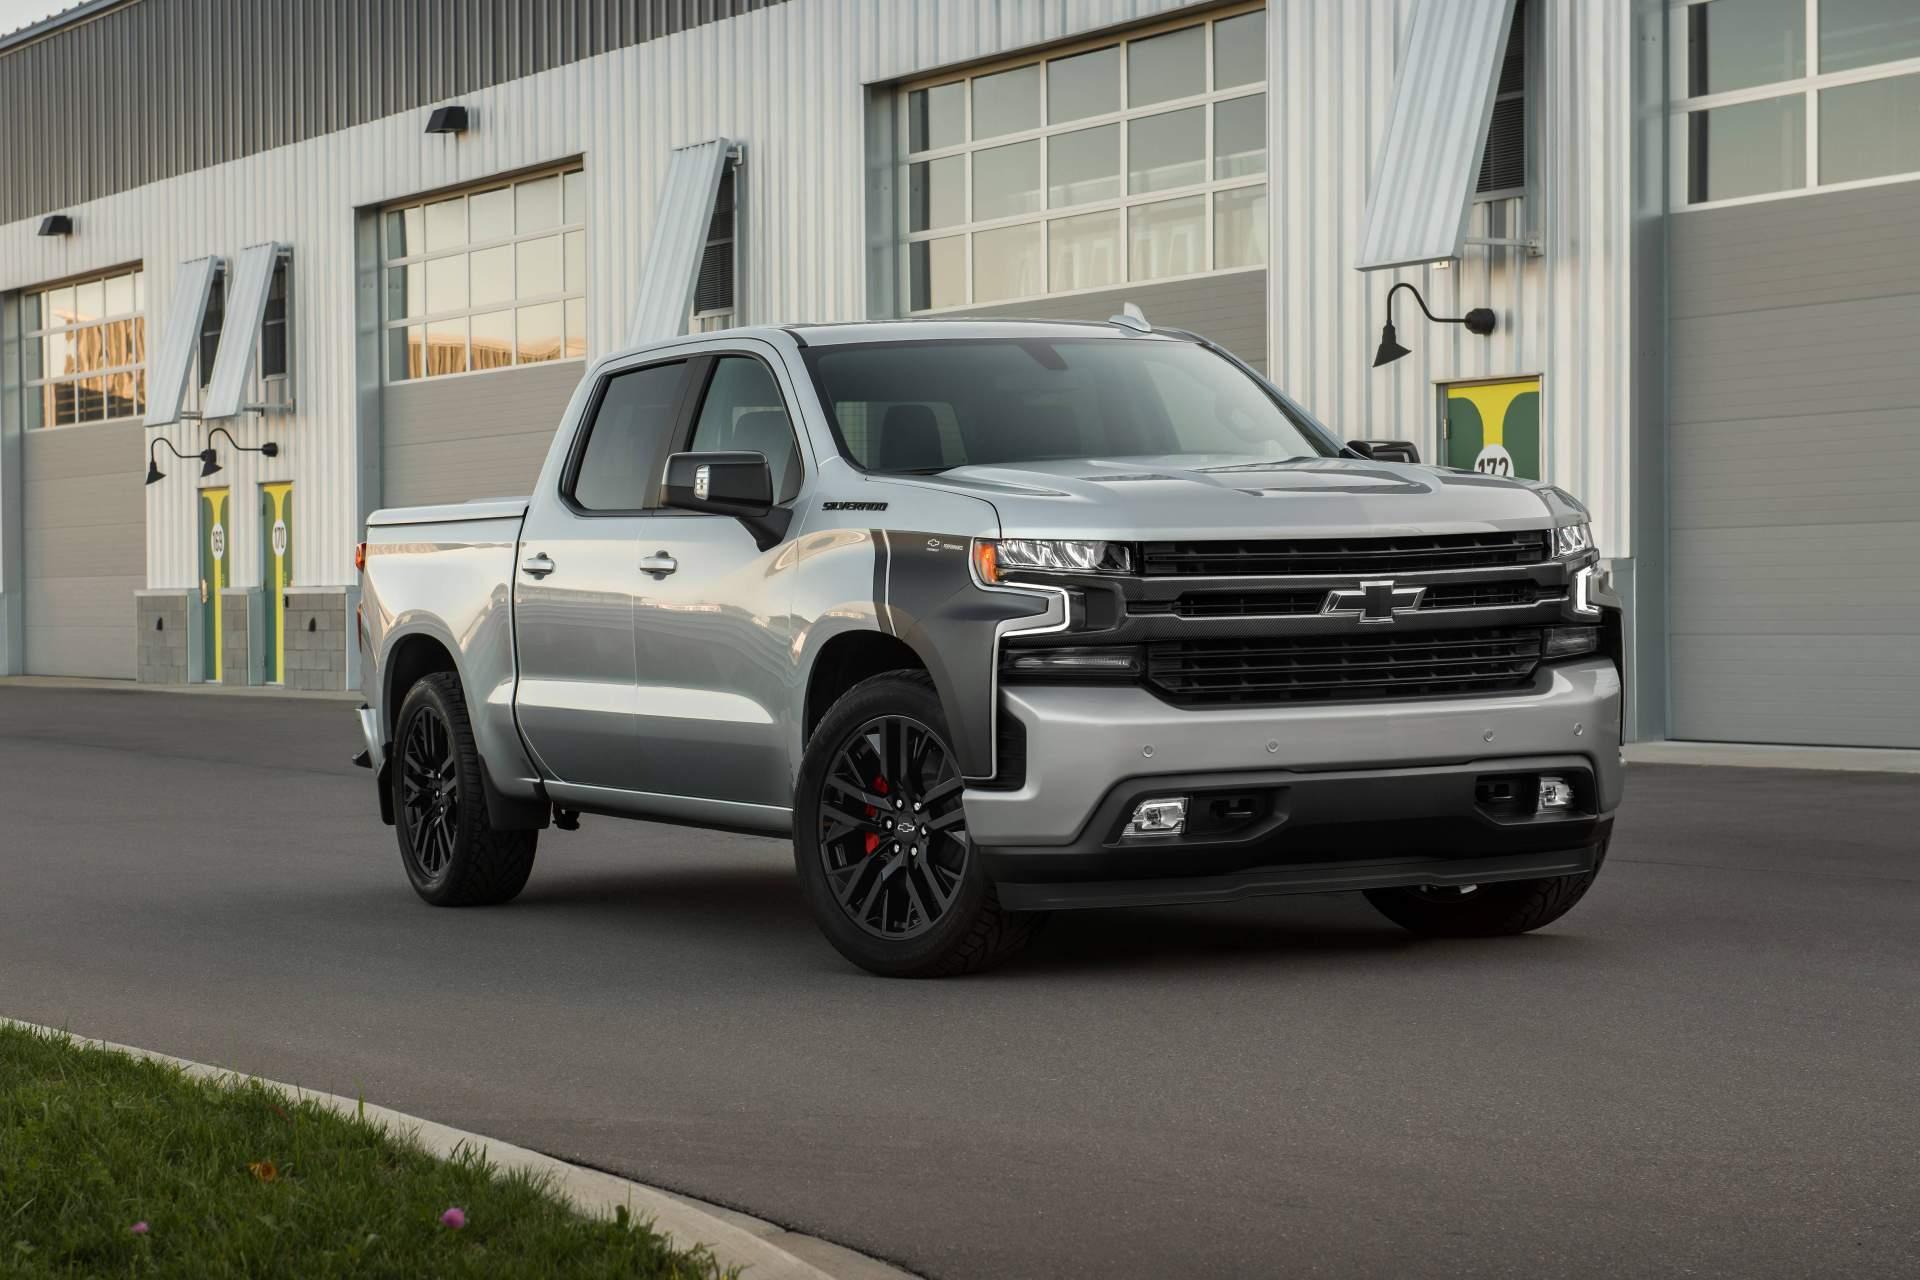 Chevrolet Tunes Four 2019 Silverado 1500 Models Calls Them Concepts